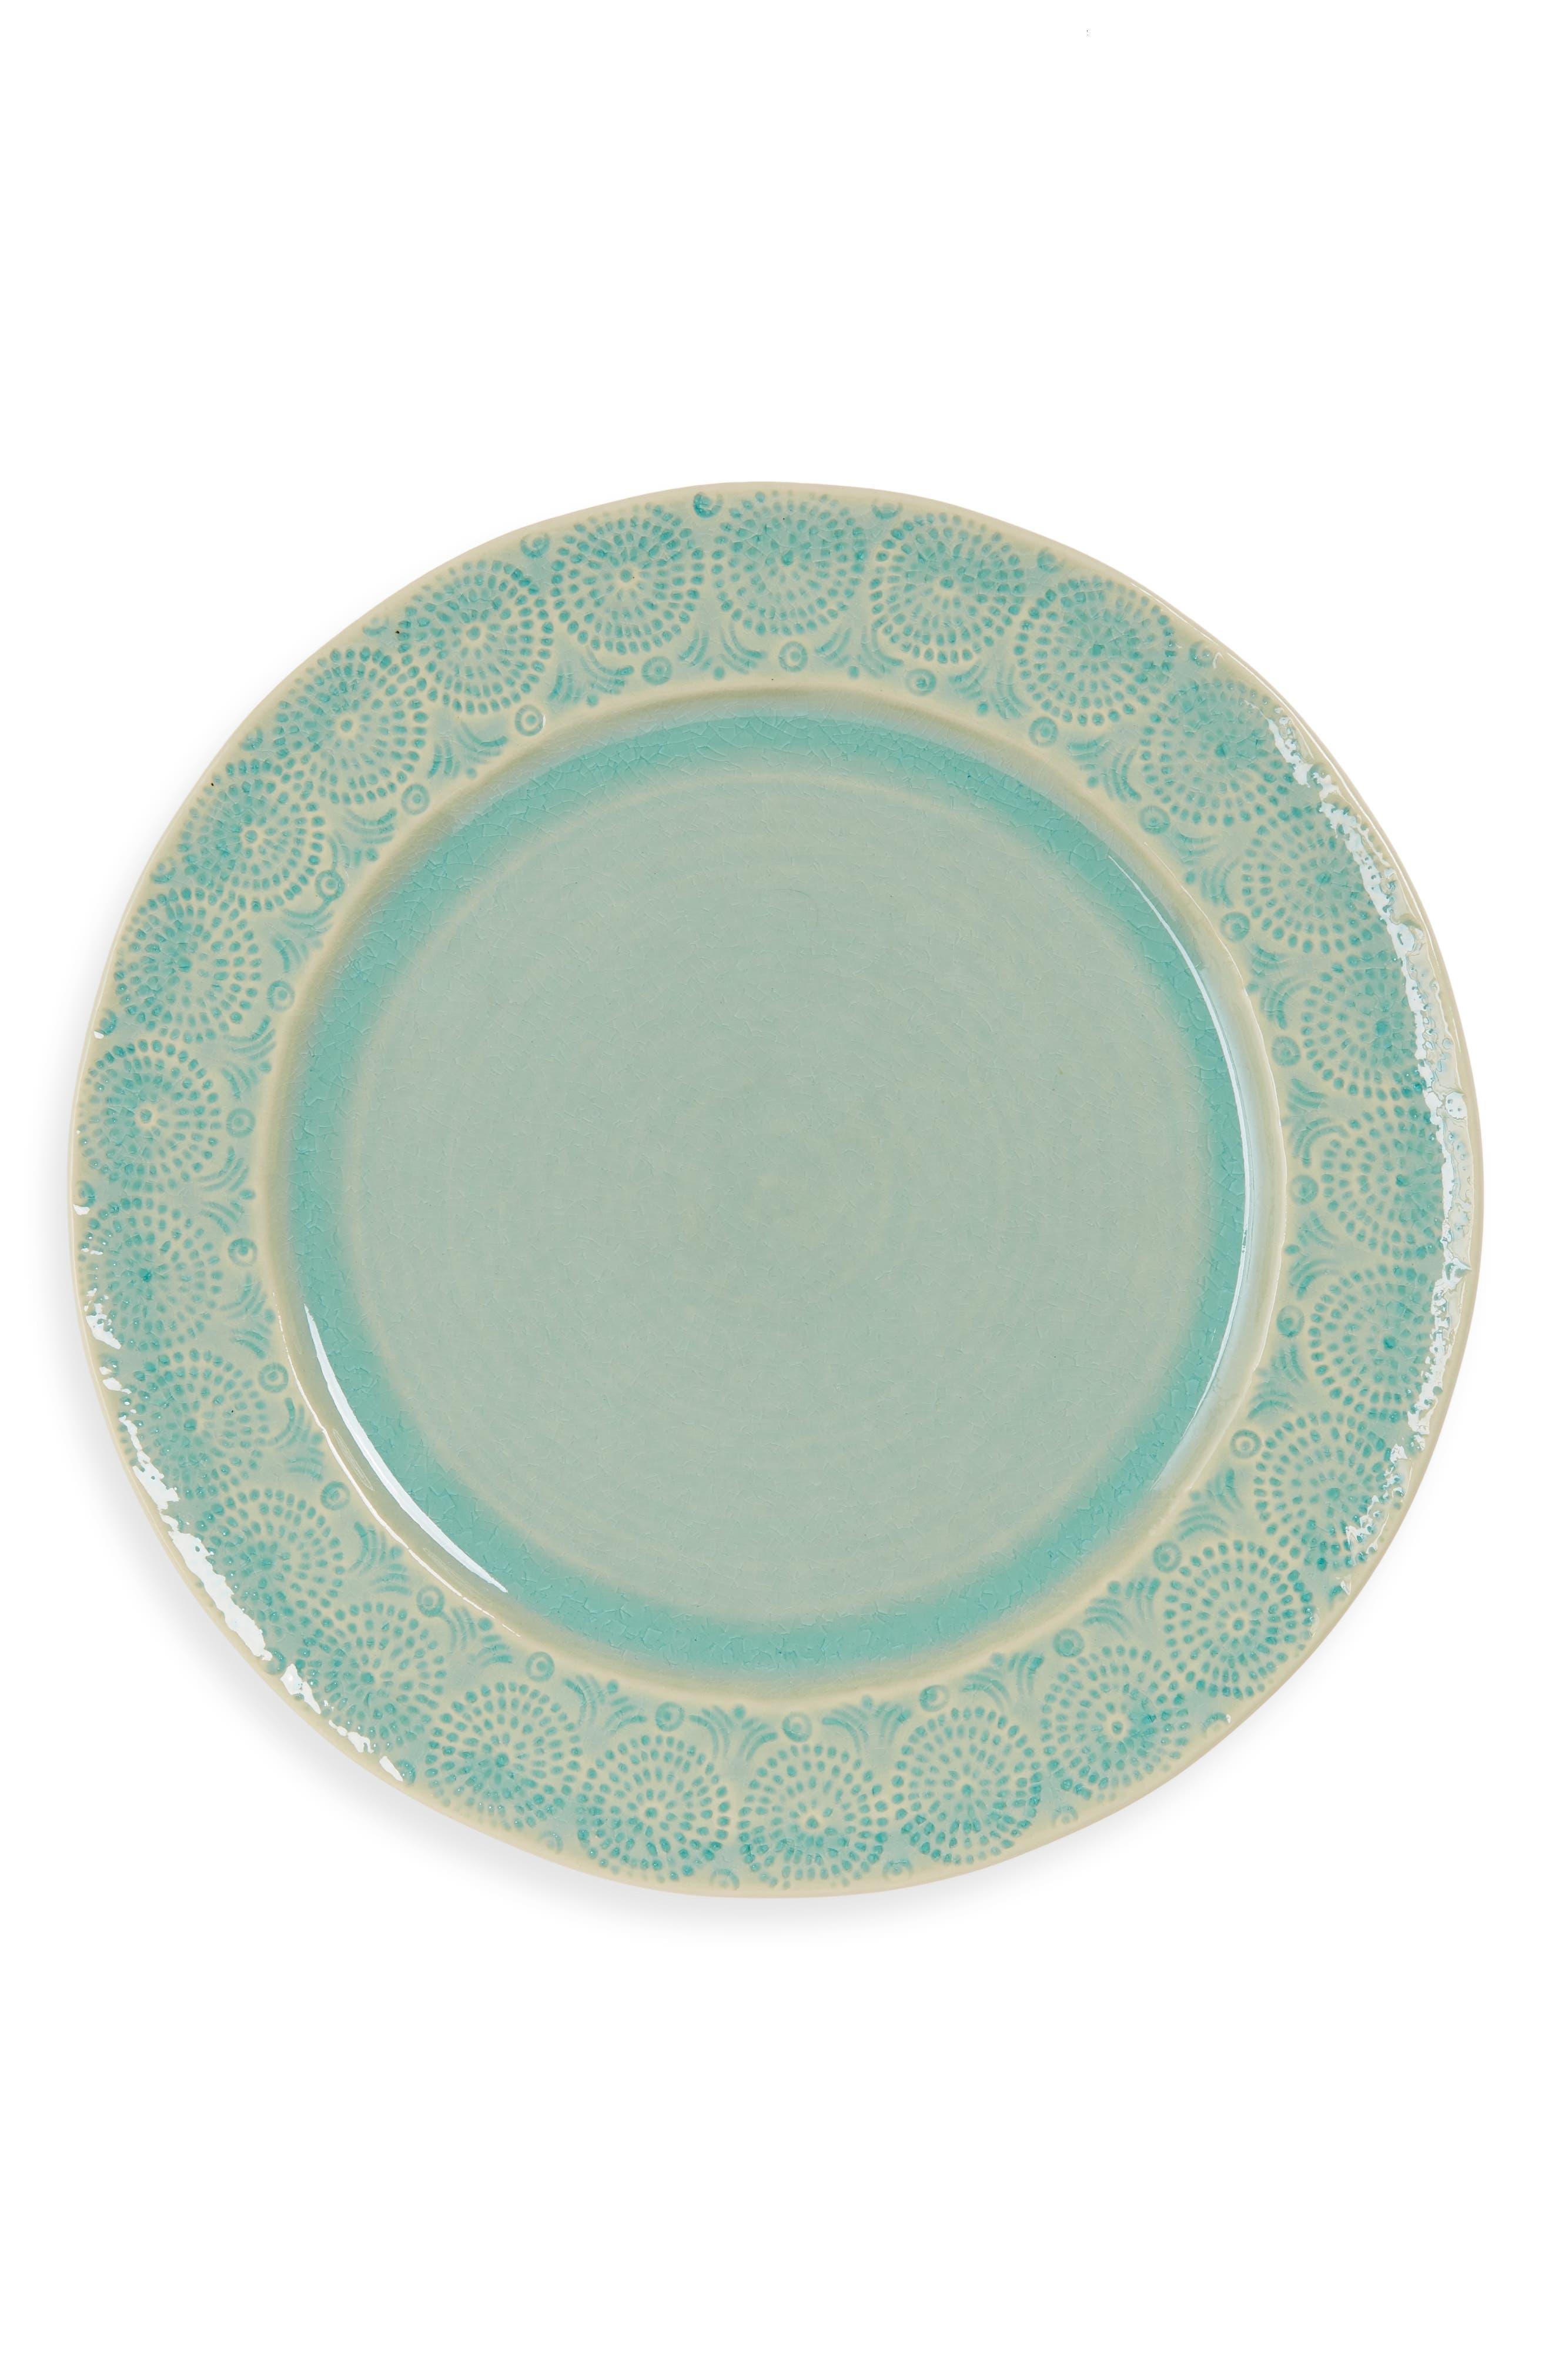 Old Havana Dinner Plate,                             Main thumbnail 1, color,                             MINT